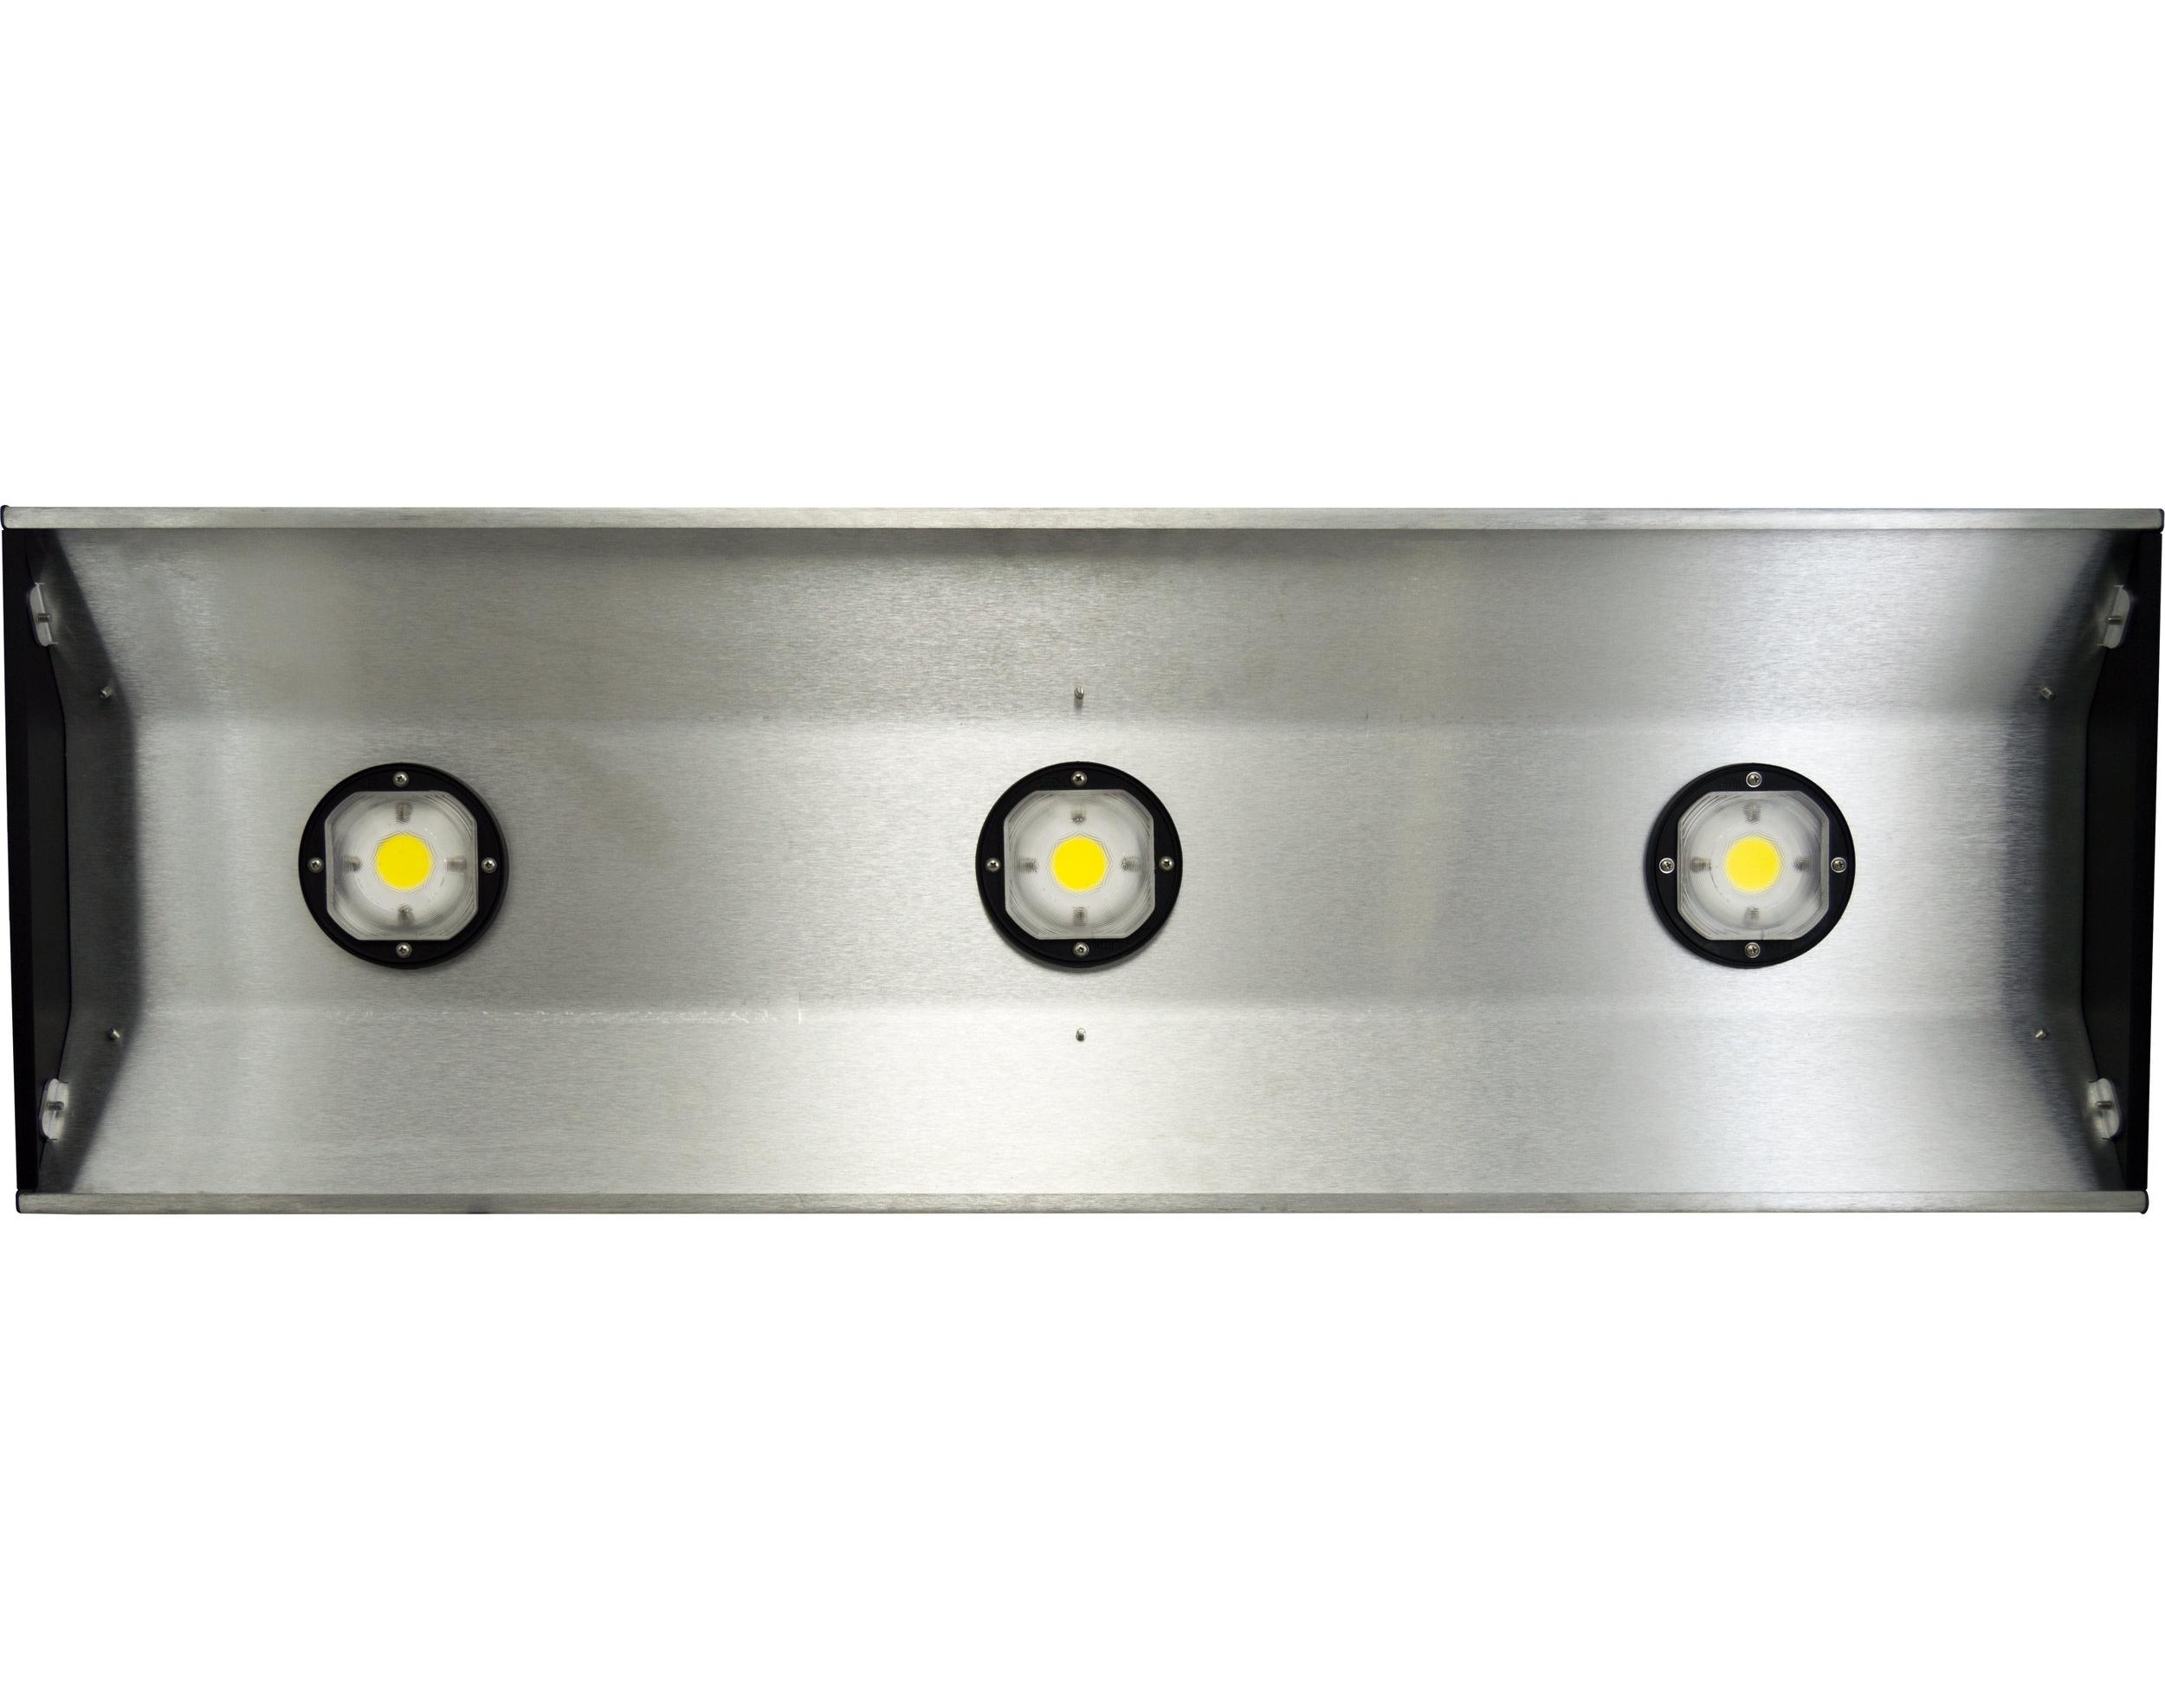 EcoBay-3e-wattstopper-5.jpg